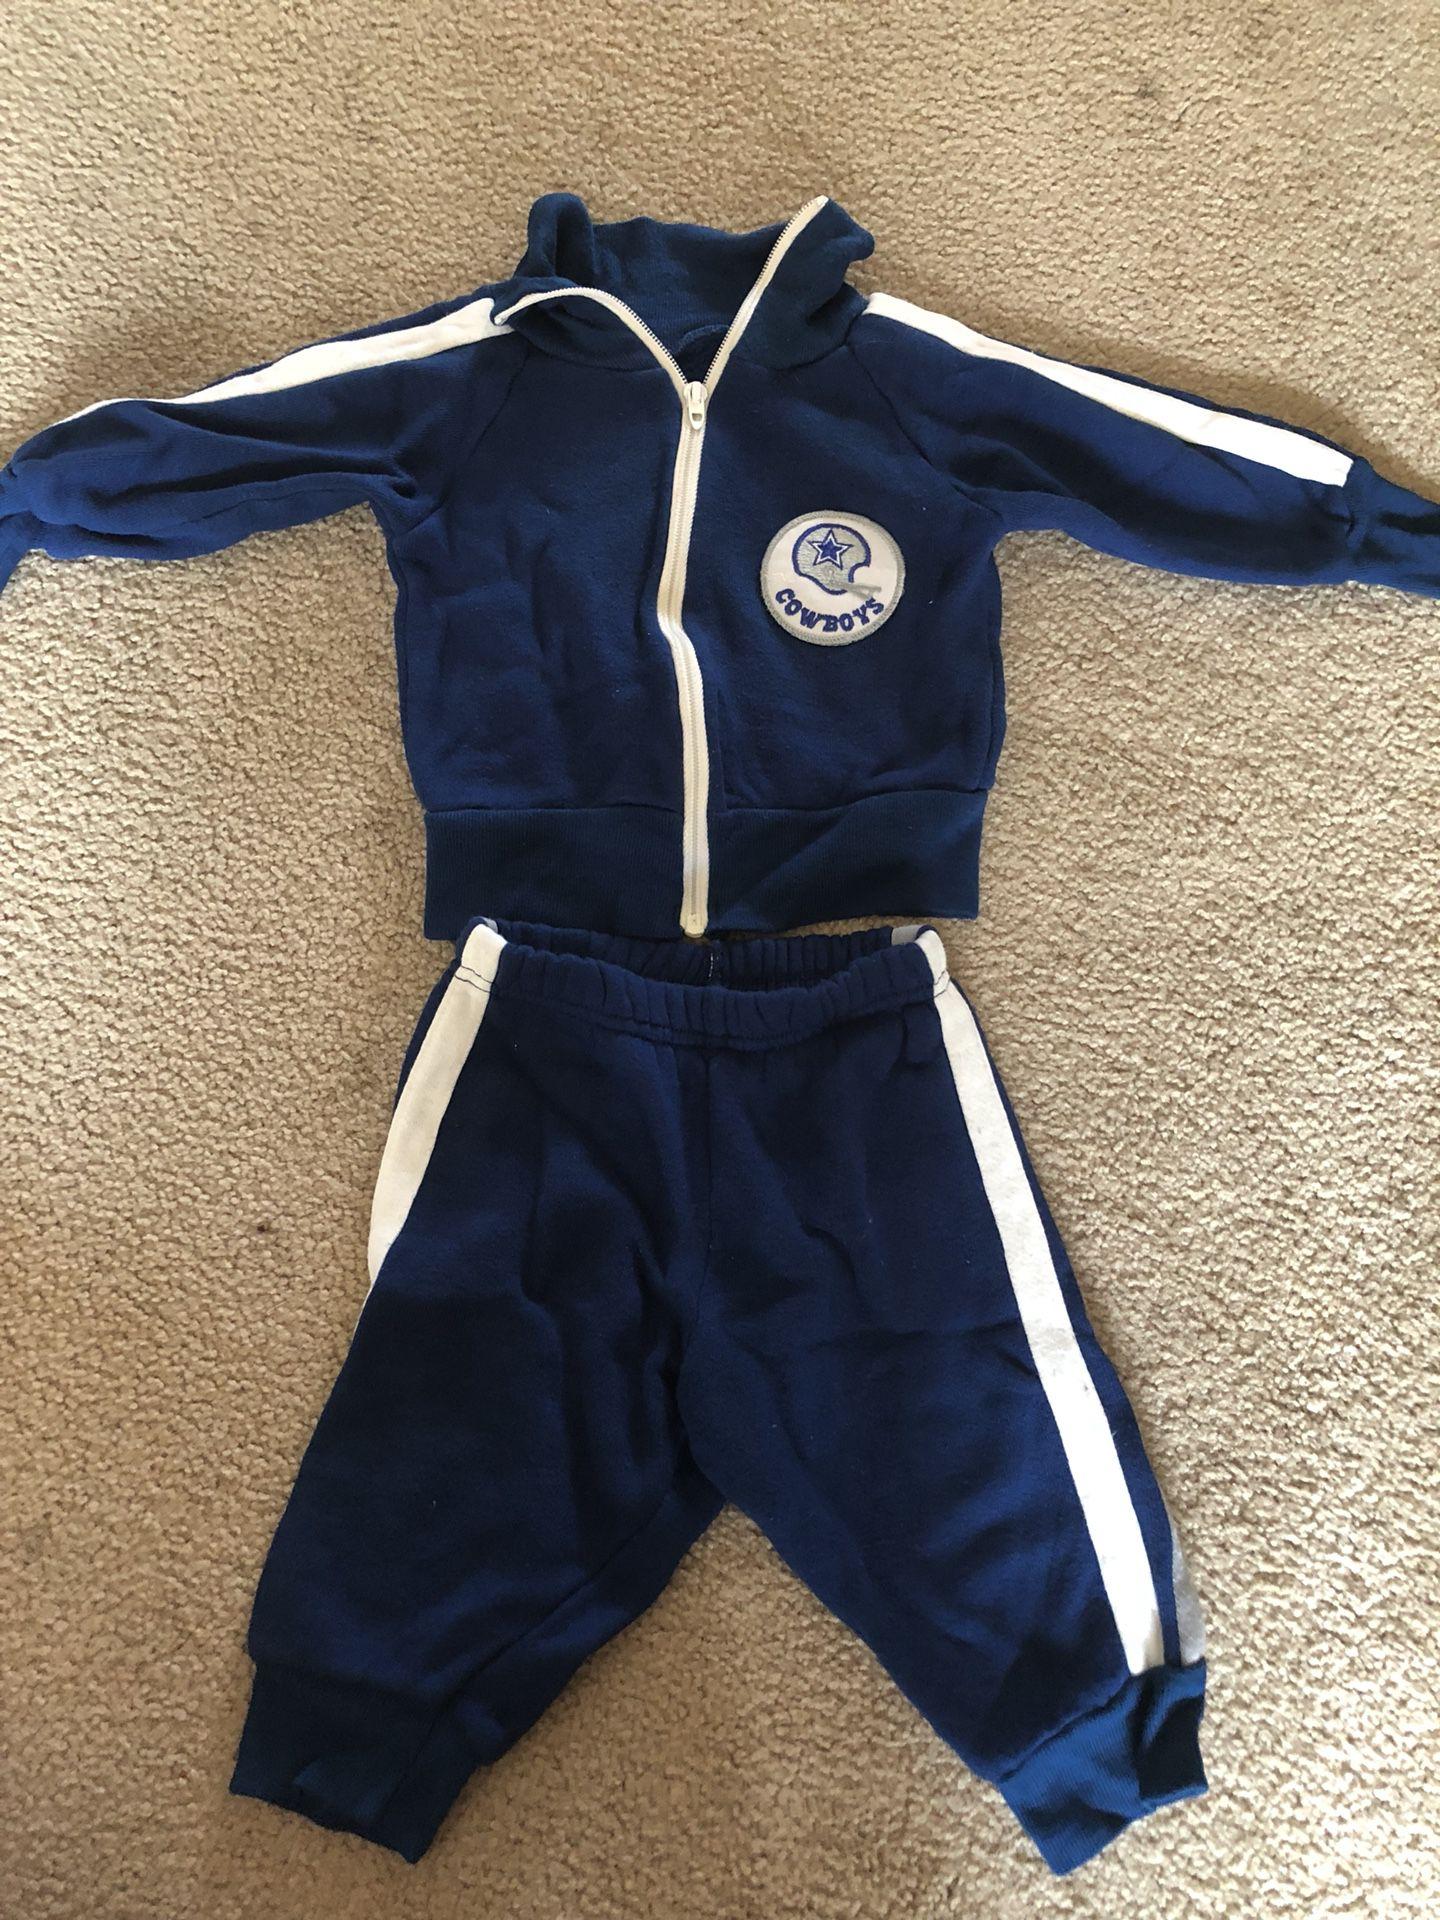 Baby Dallas Coyboys jump suit